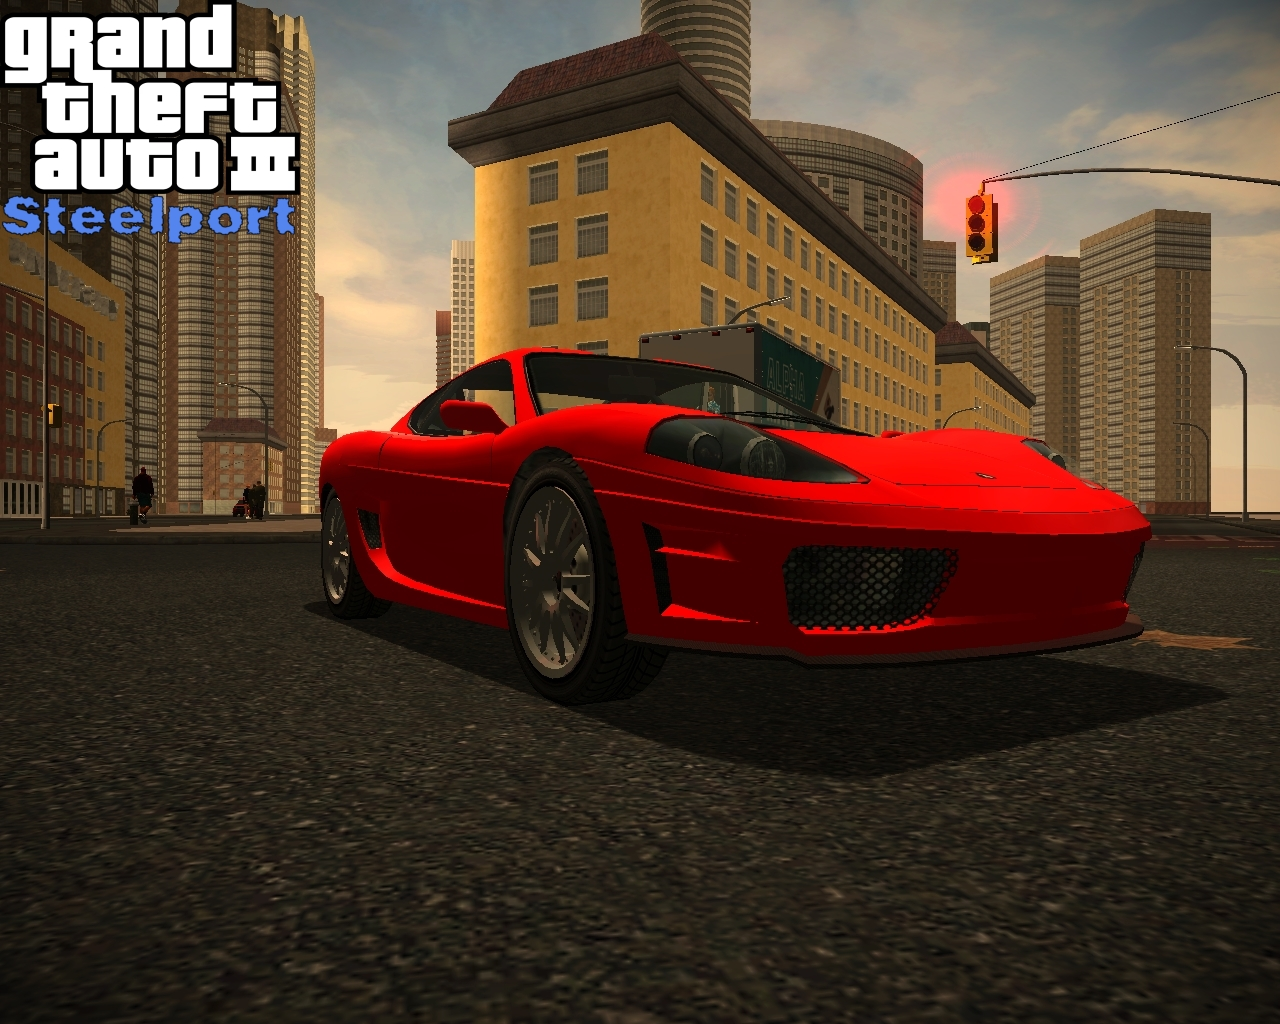 PRESENTATION2.jpg - Grand Theft Auto 3